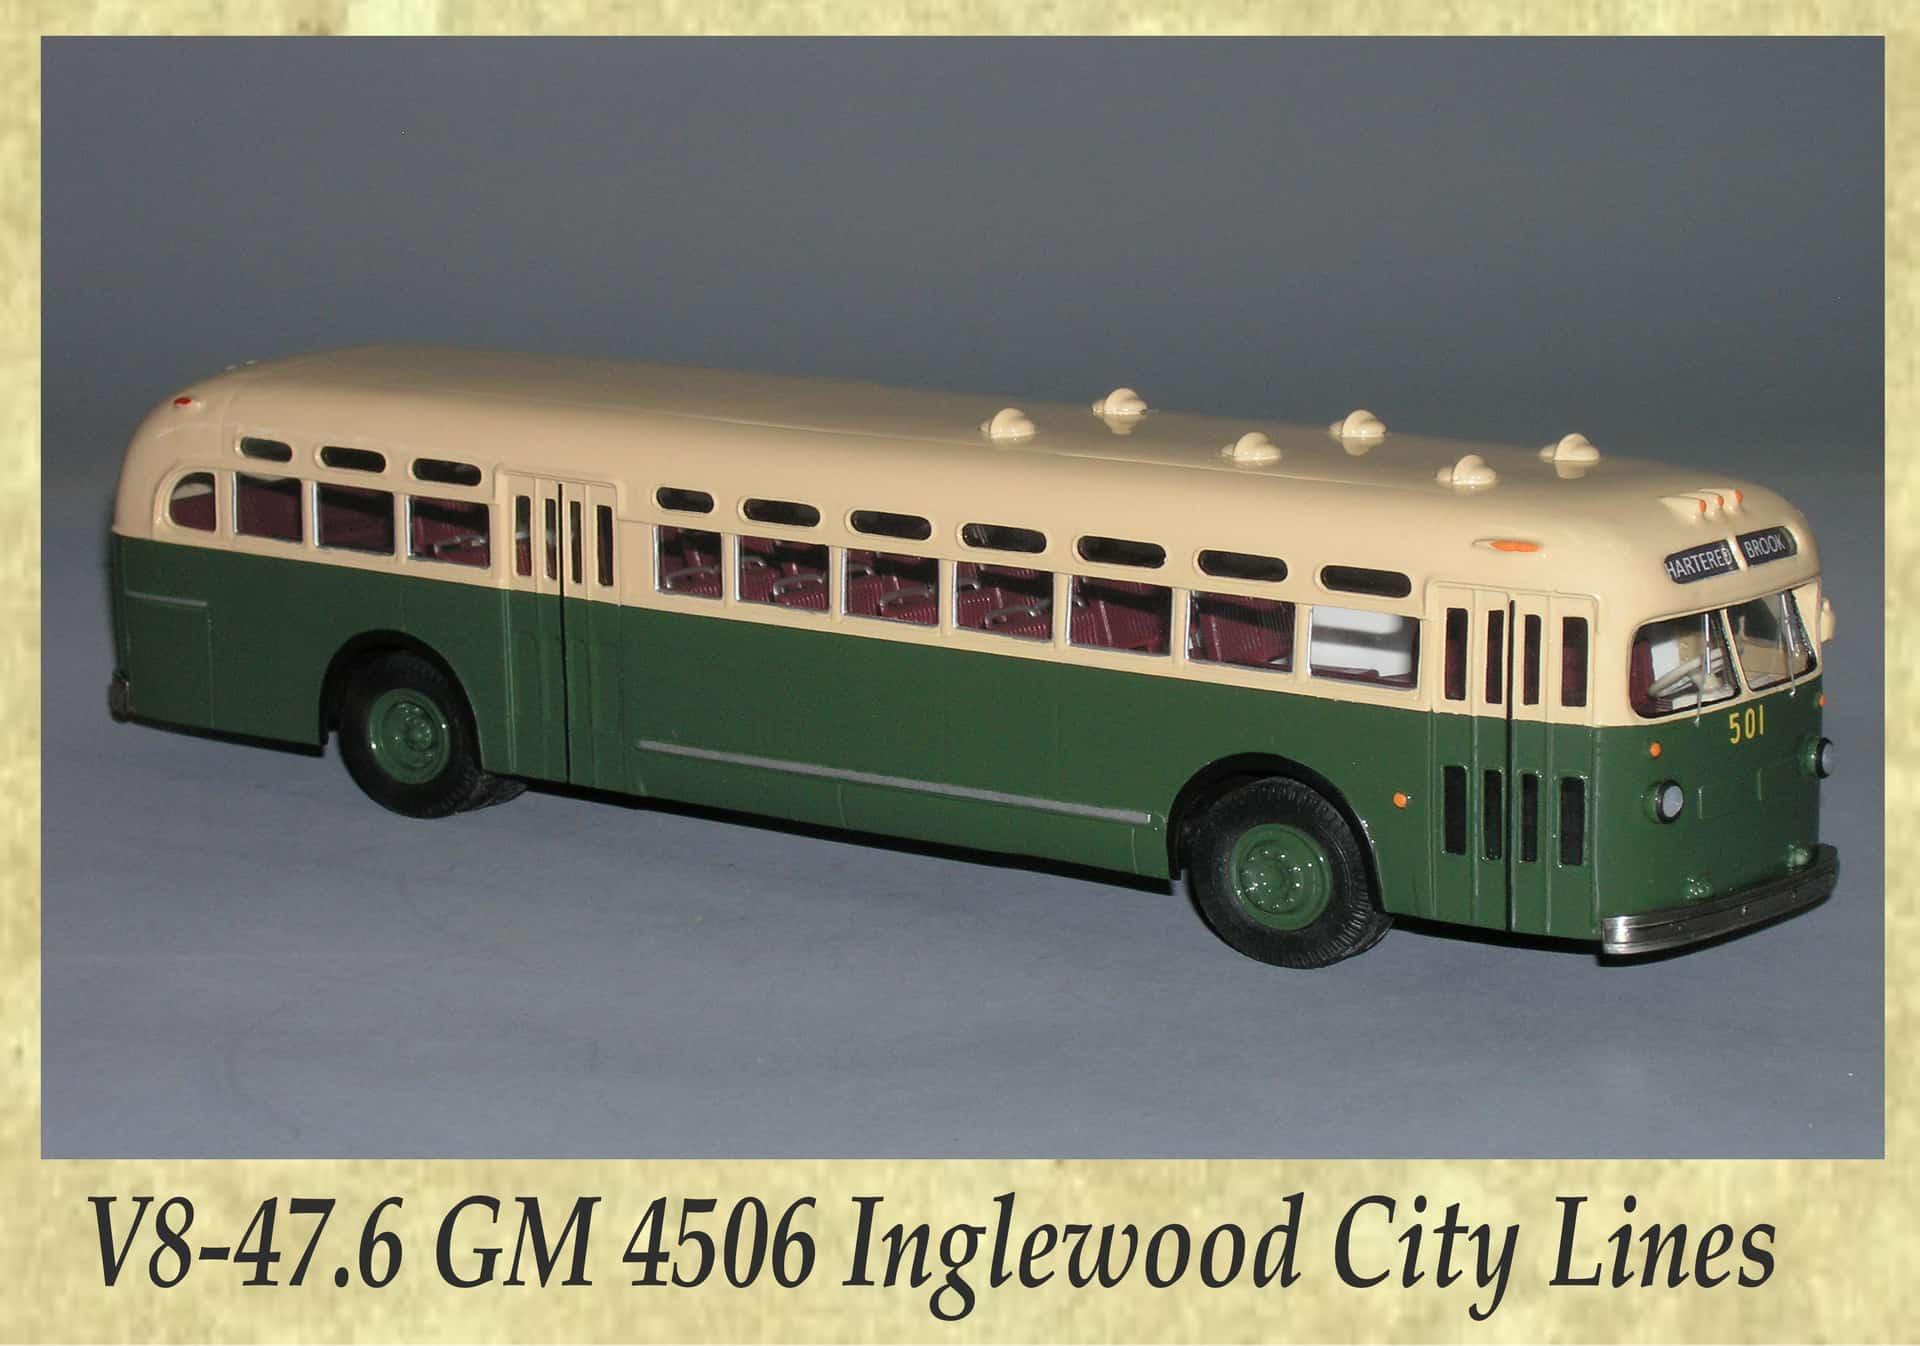 V8-47.6 GM 4506 Inglewood City Lines